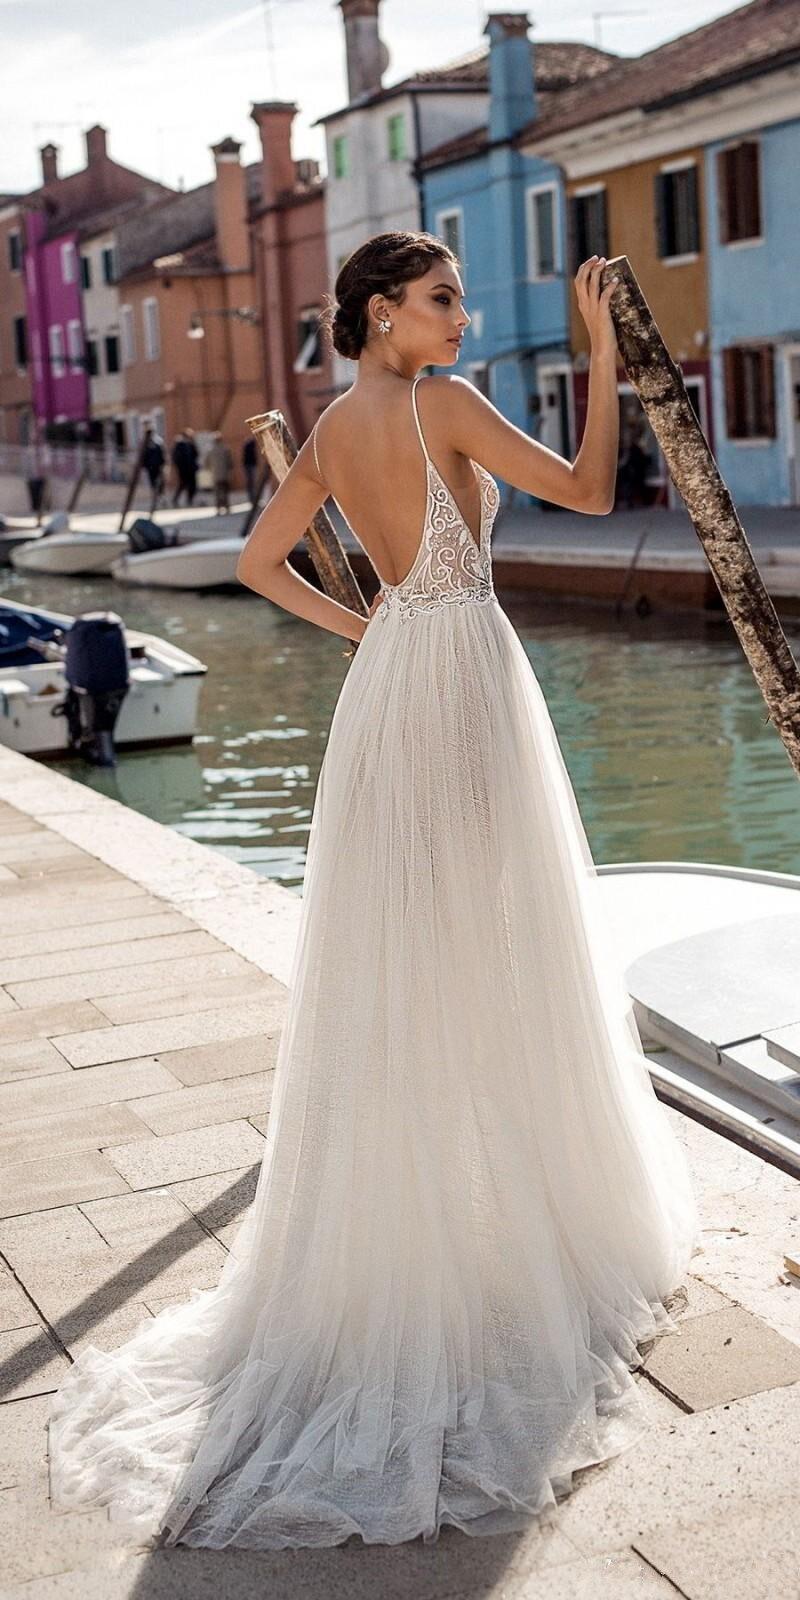 gali-karten-2019-beach-wedding-dresses-side-split-spaghetti-sexy-illusion-boho-a-line-wedding-dresses-pearls-backless-bohemian-bridal-gowns (6)